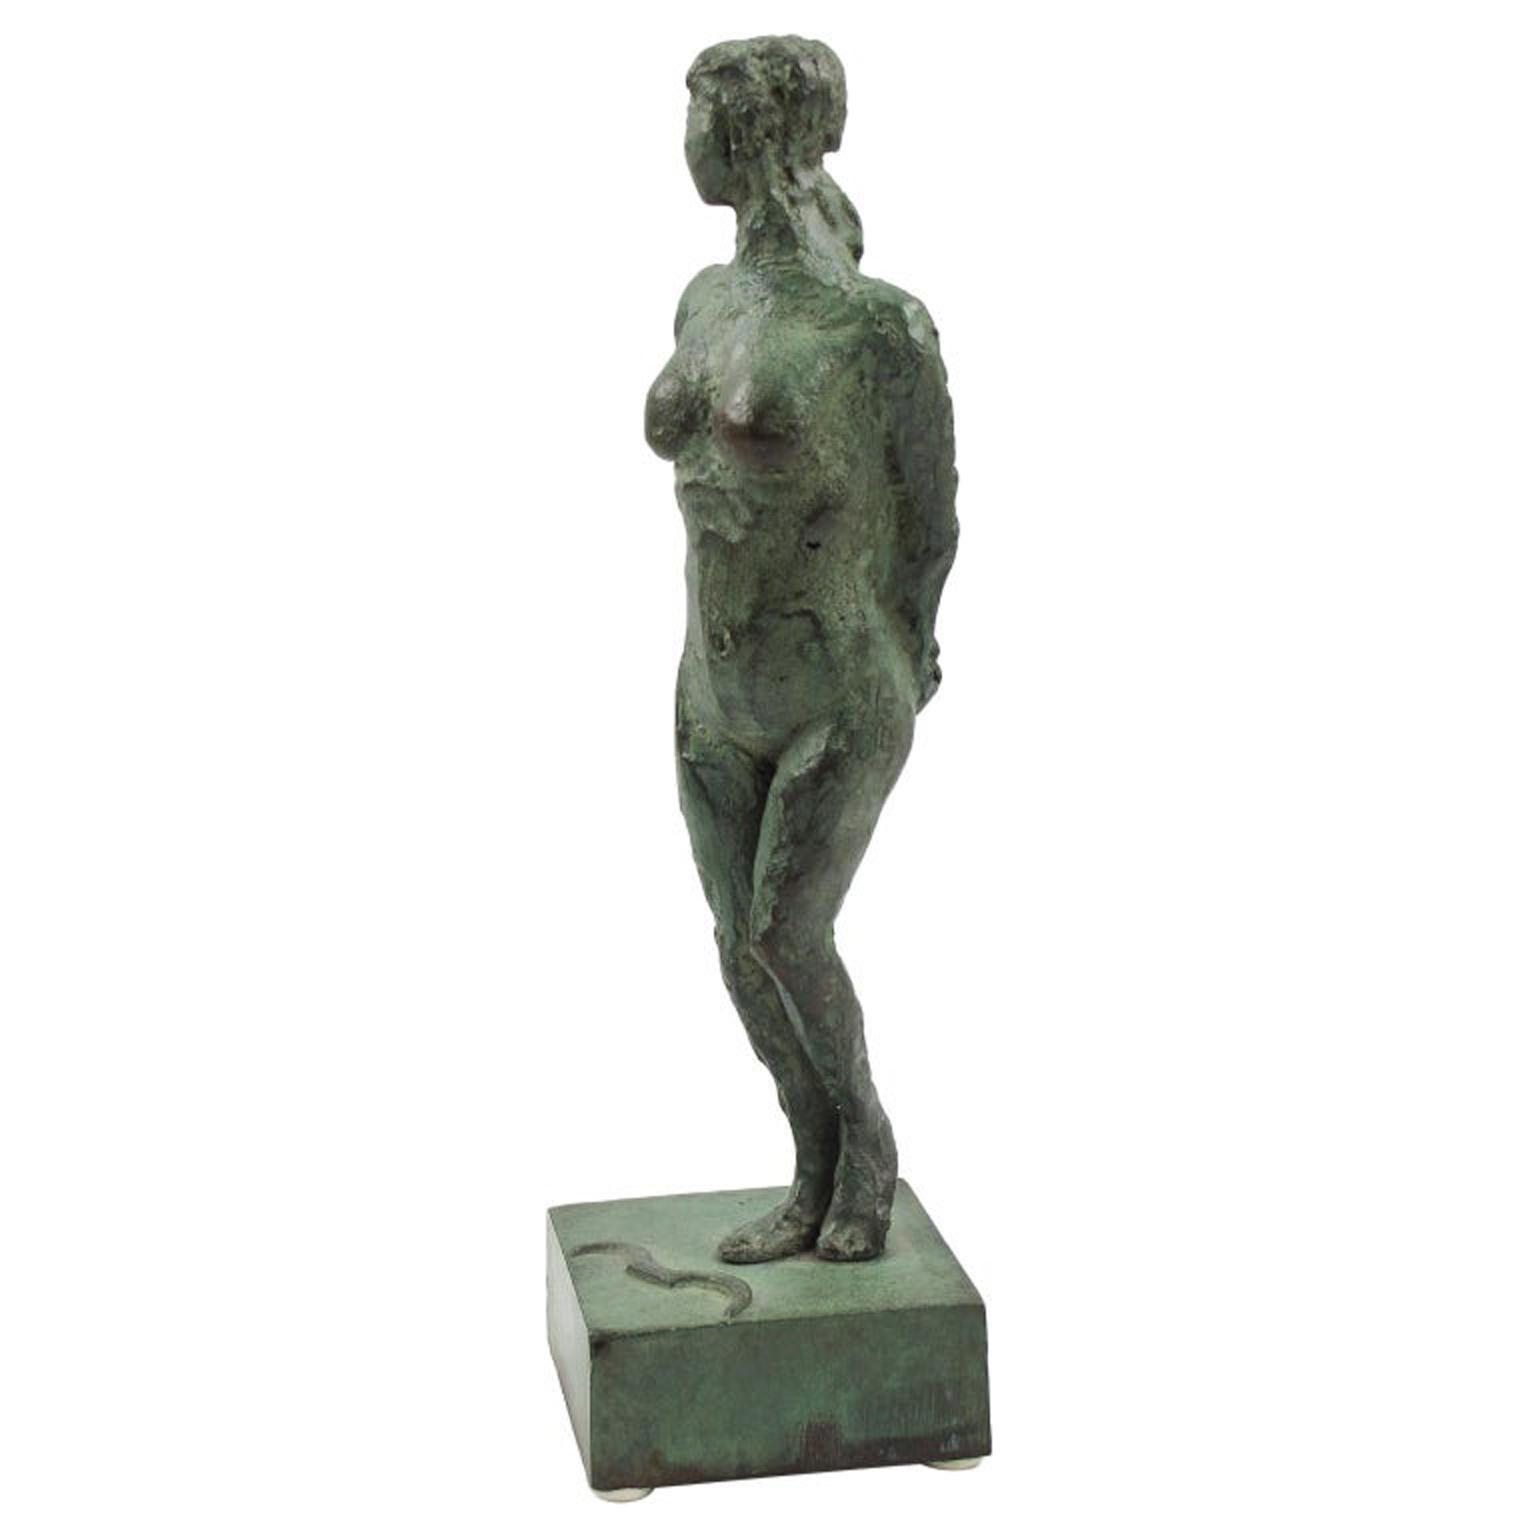 Diana the Huntress French Art Deco Artemis Bronze Sculpture